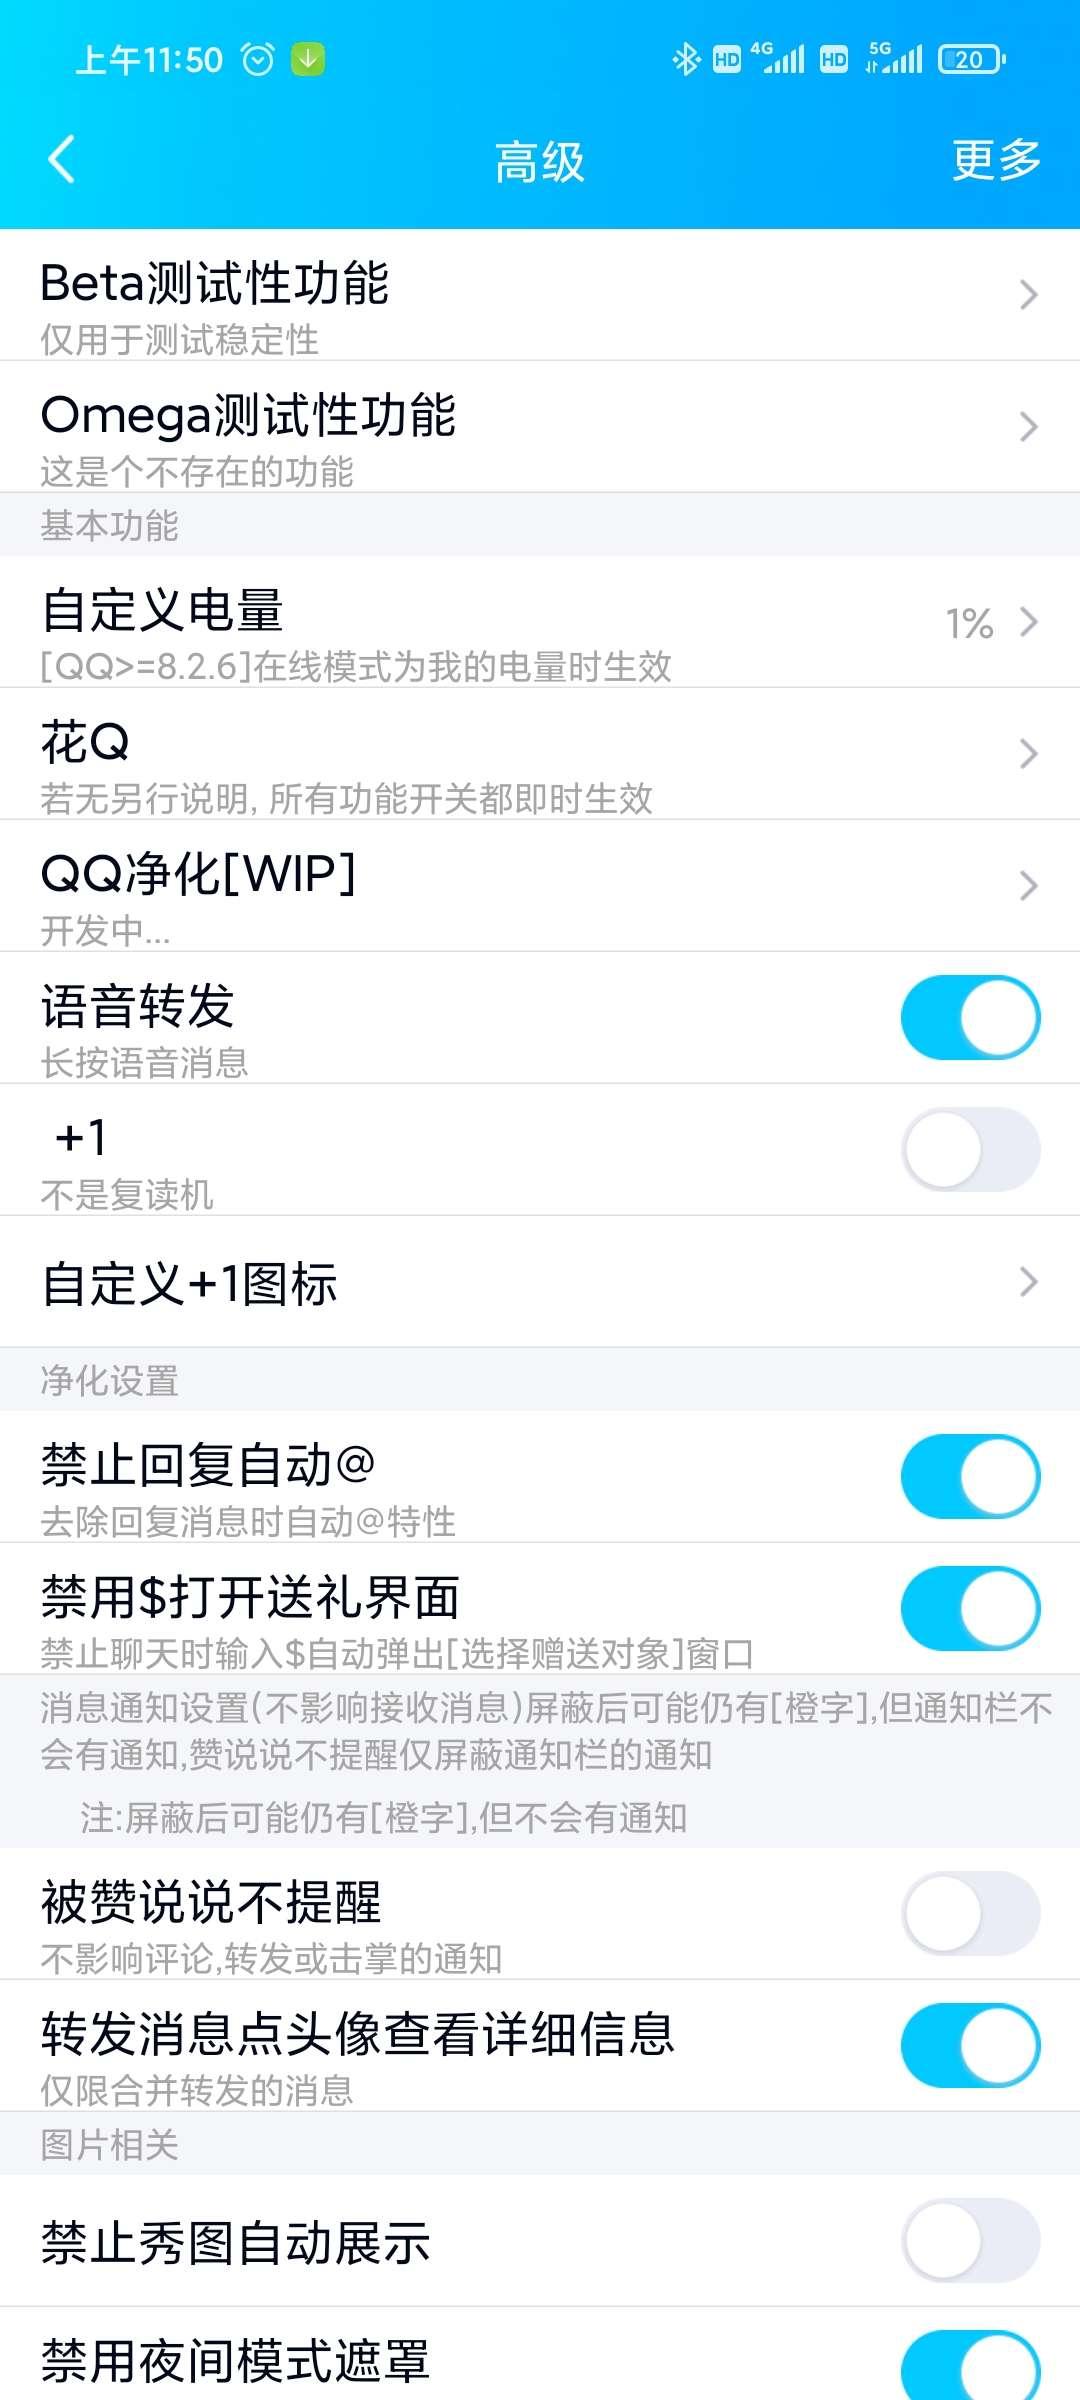 QQ模块qn0.17版本